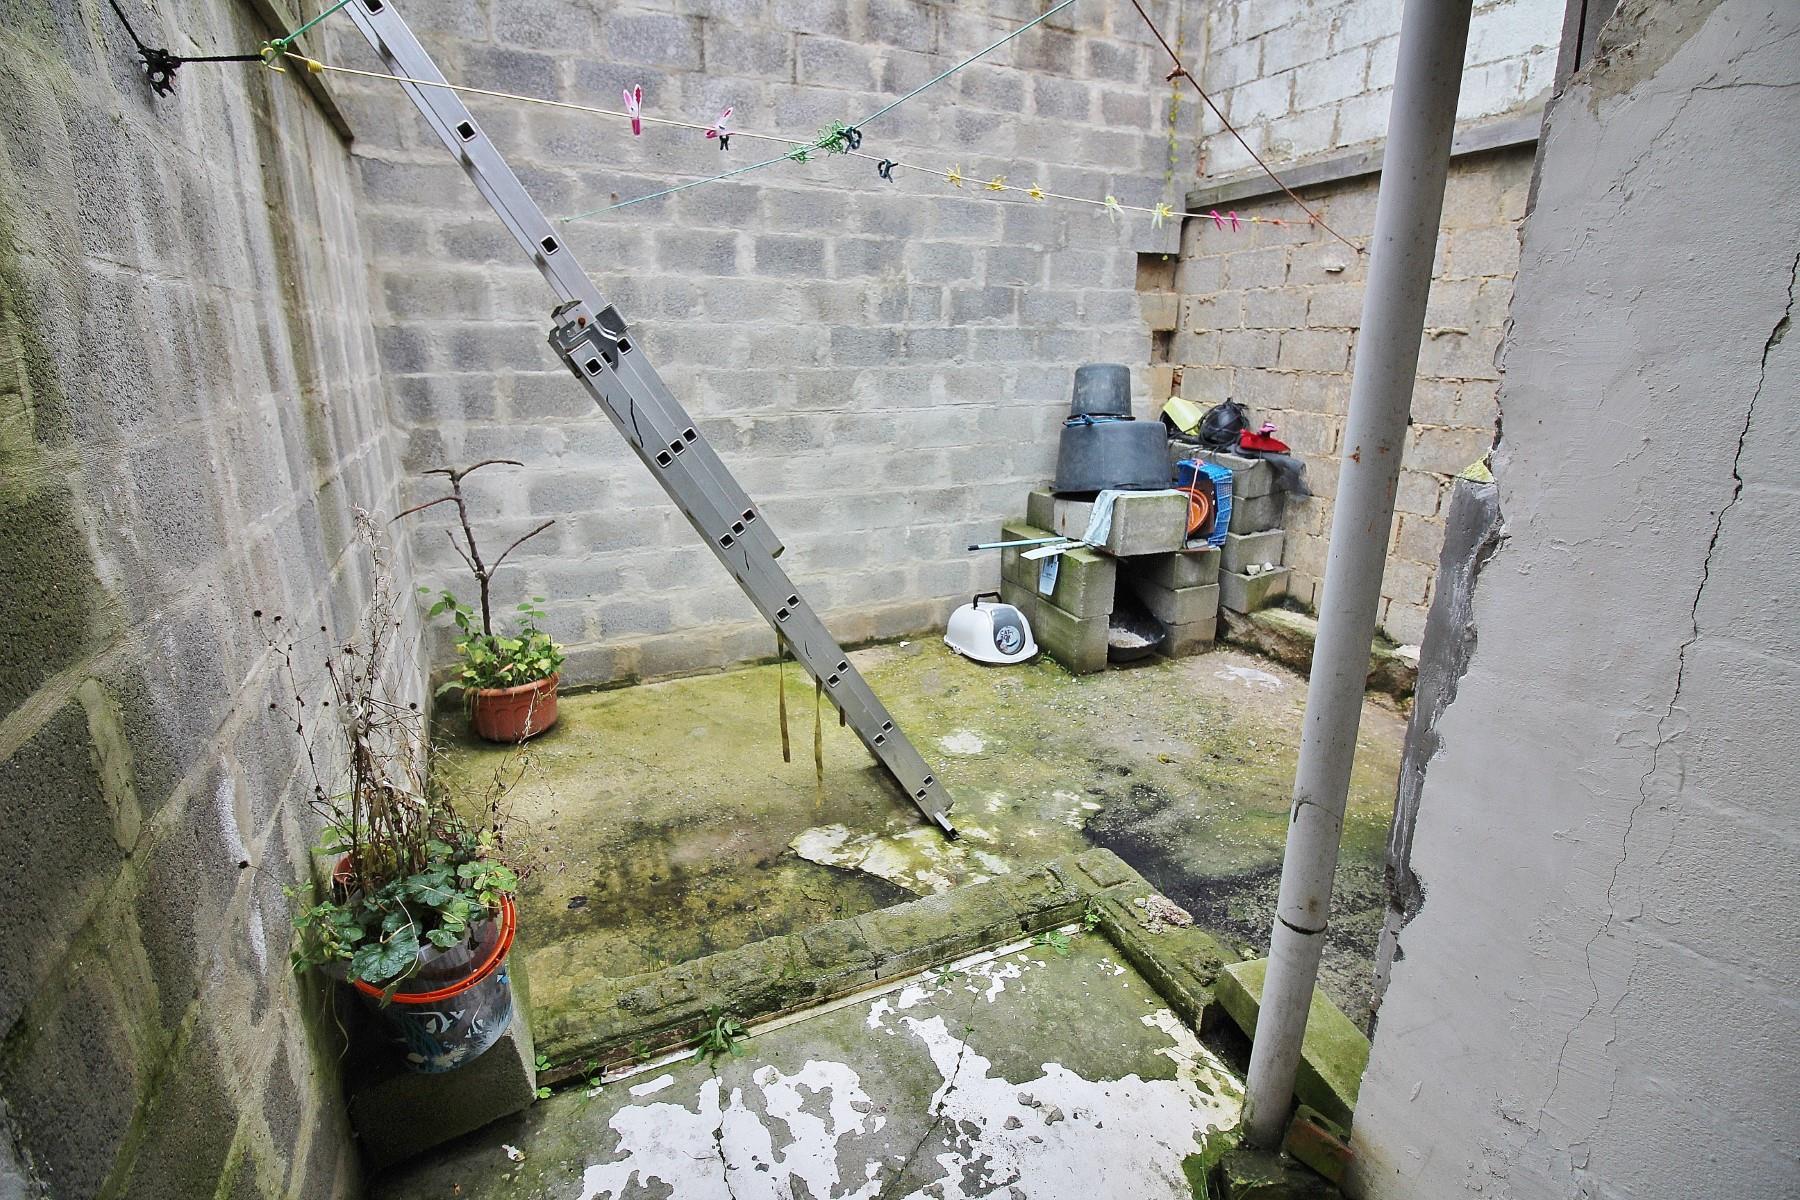 Maison - Seraing Jemeppesur-Meuse - #3879549-8